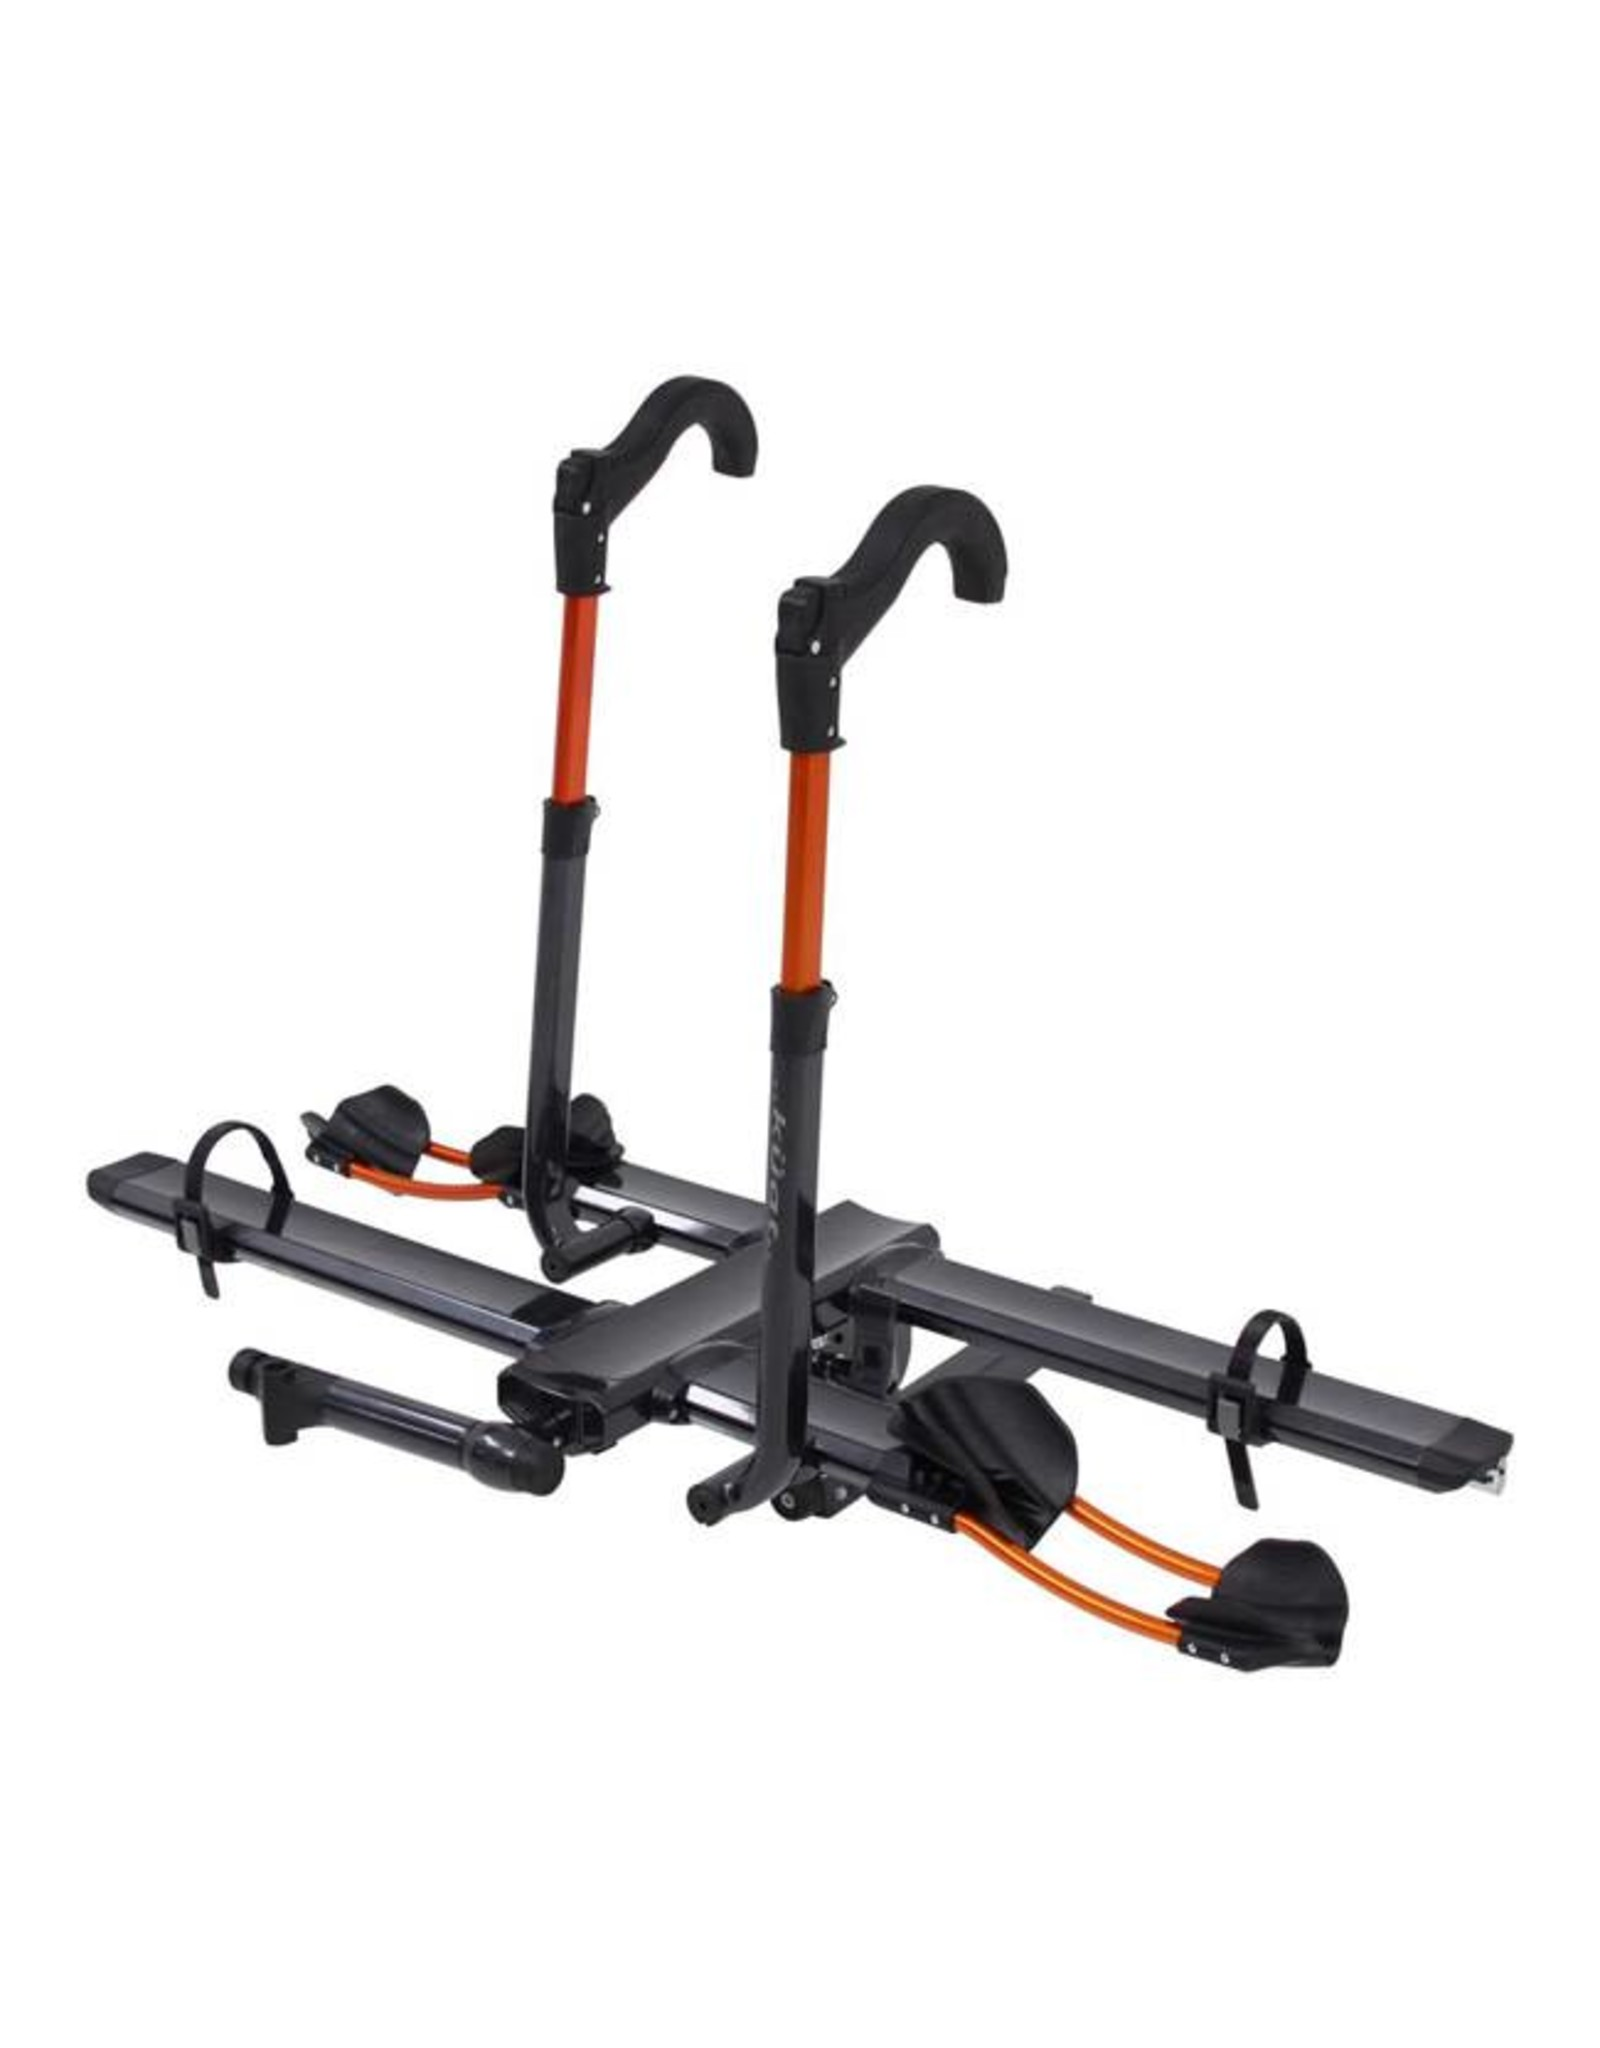 "Kuat Kuat NV 2.0 2-Bike Tray Hitch Rack: Metallic Gray and Orange, 2"" Receiver"